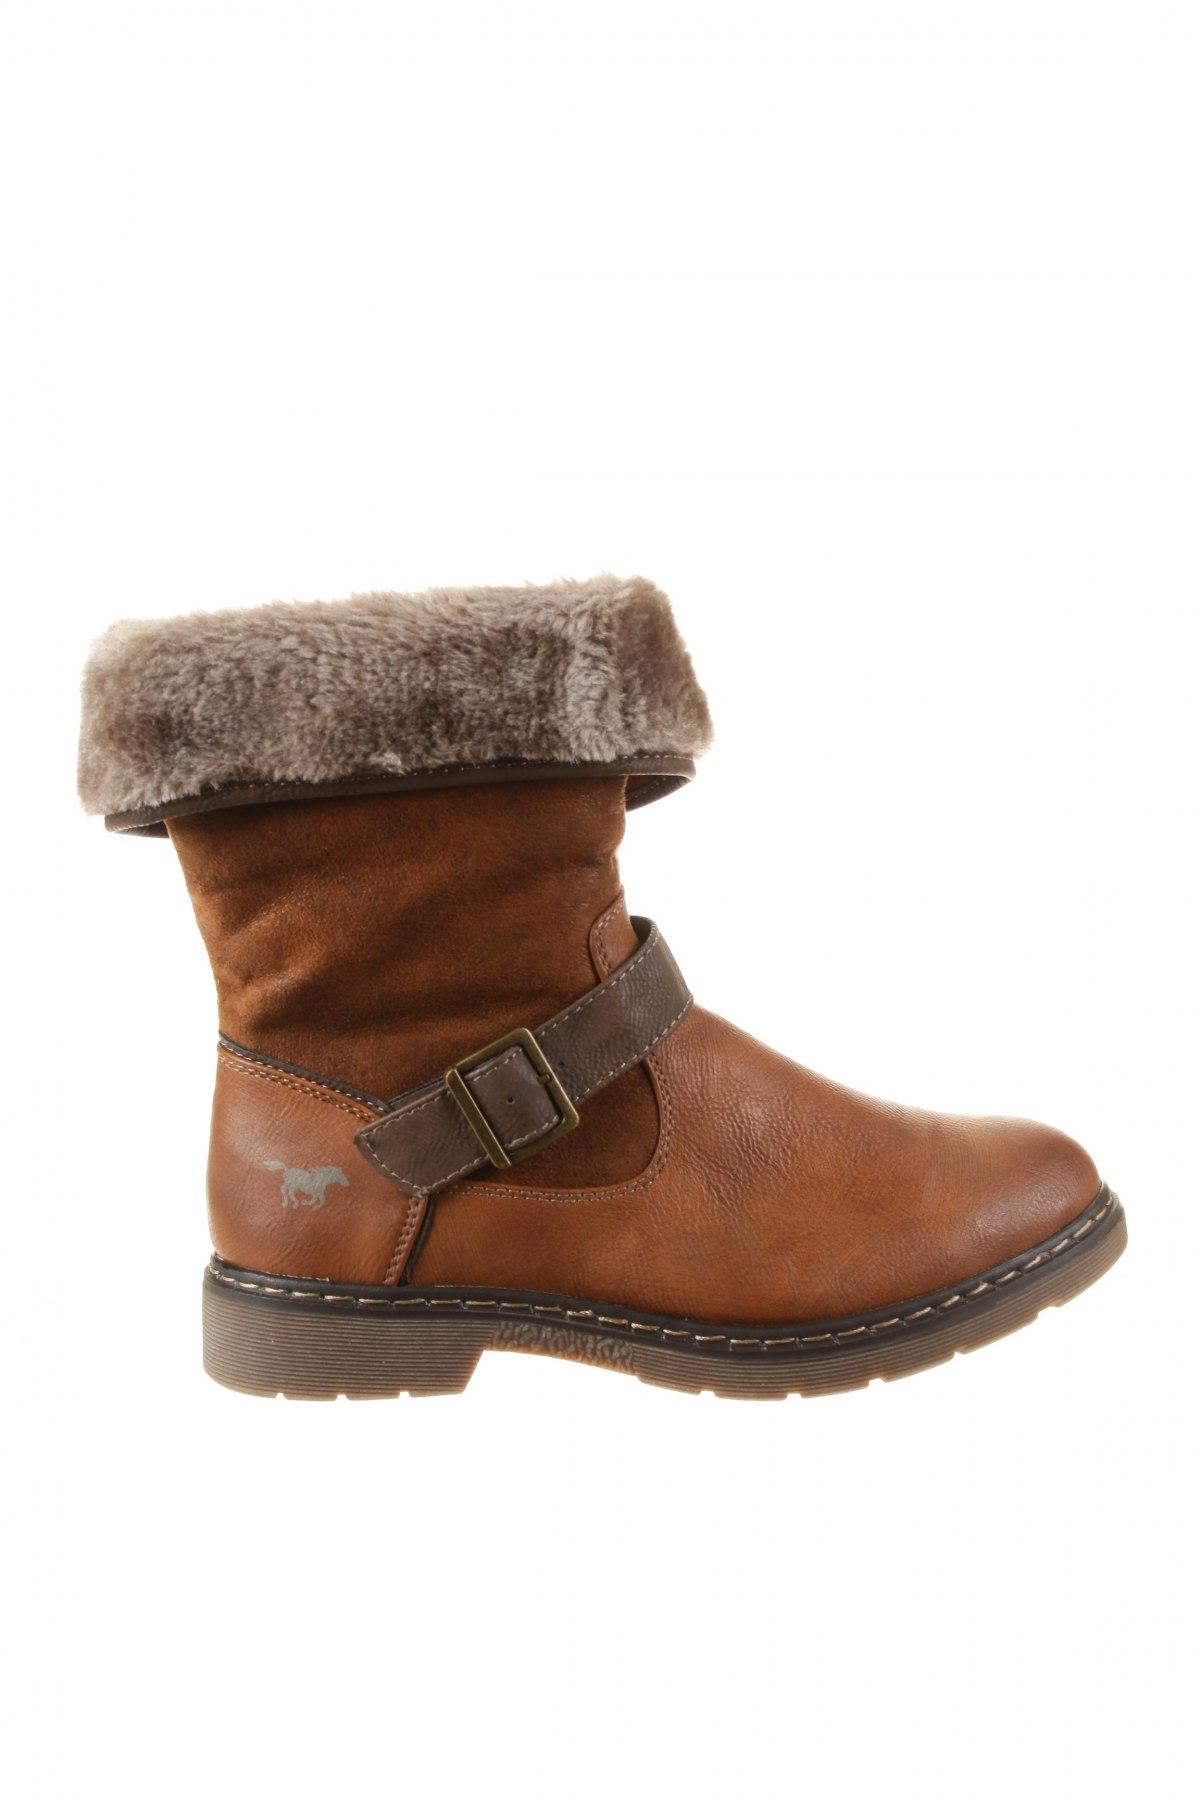 723090efcc Γυναικείες μπότες Mustang - σε συμφέρουσα τιμή στο Remix -  102478615